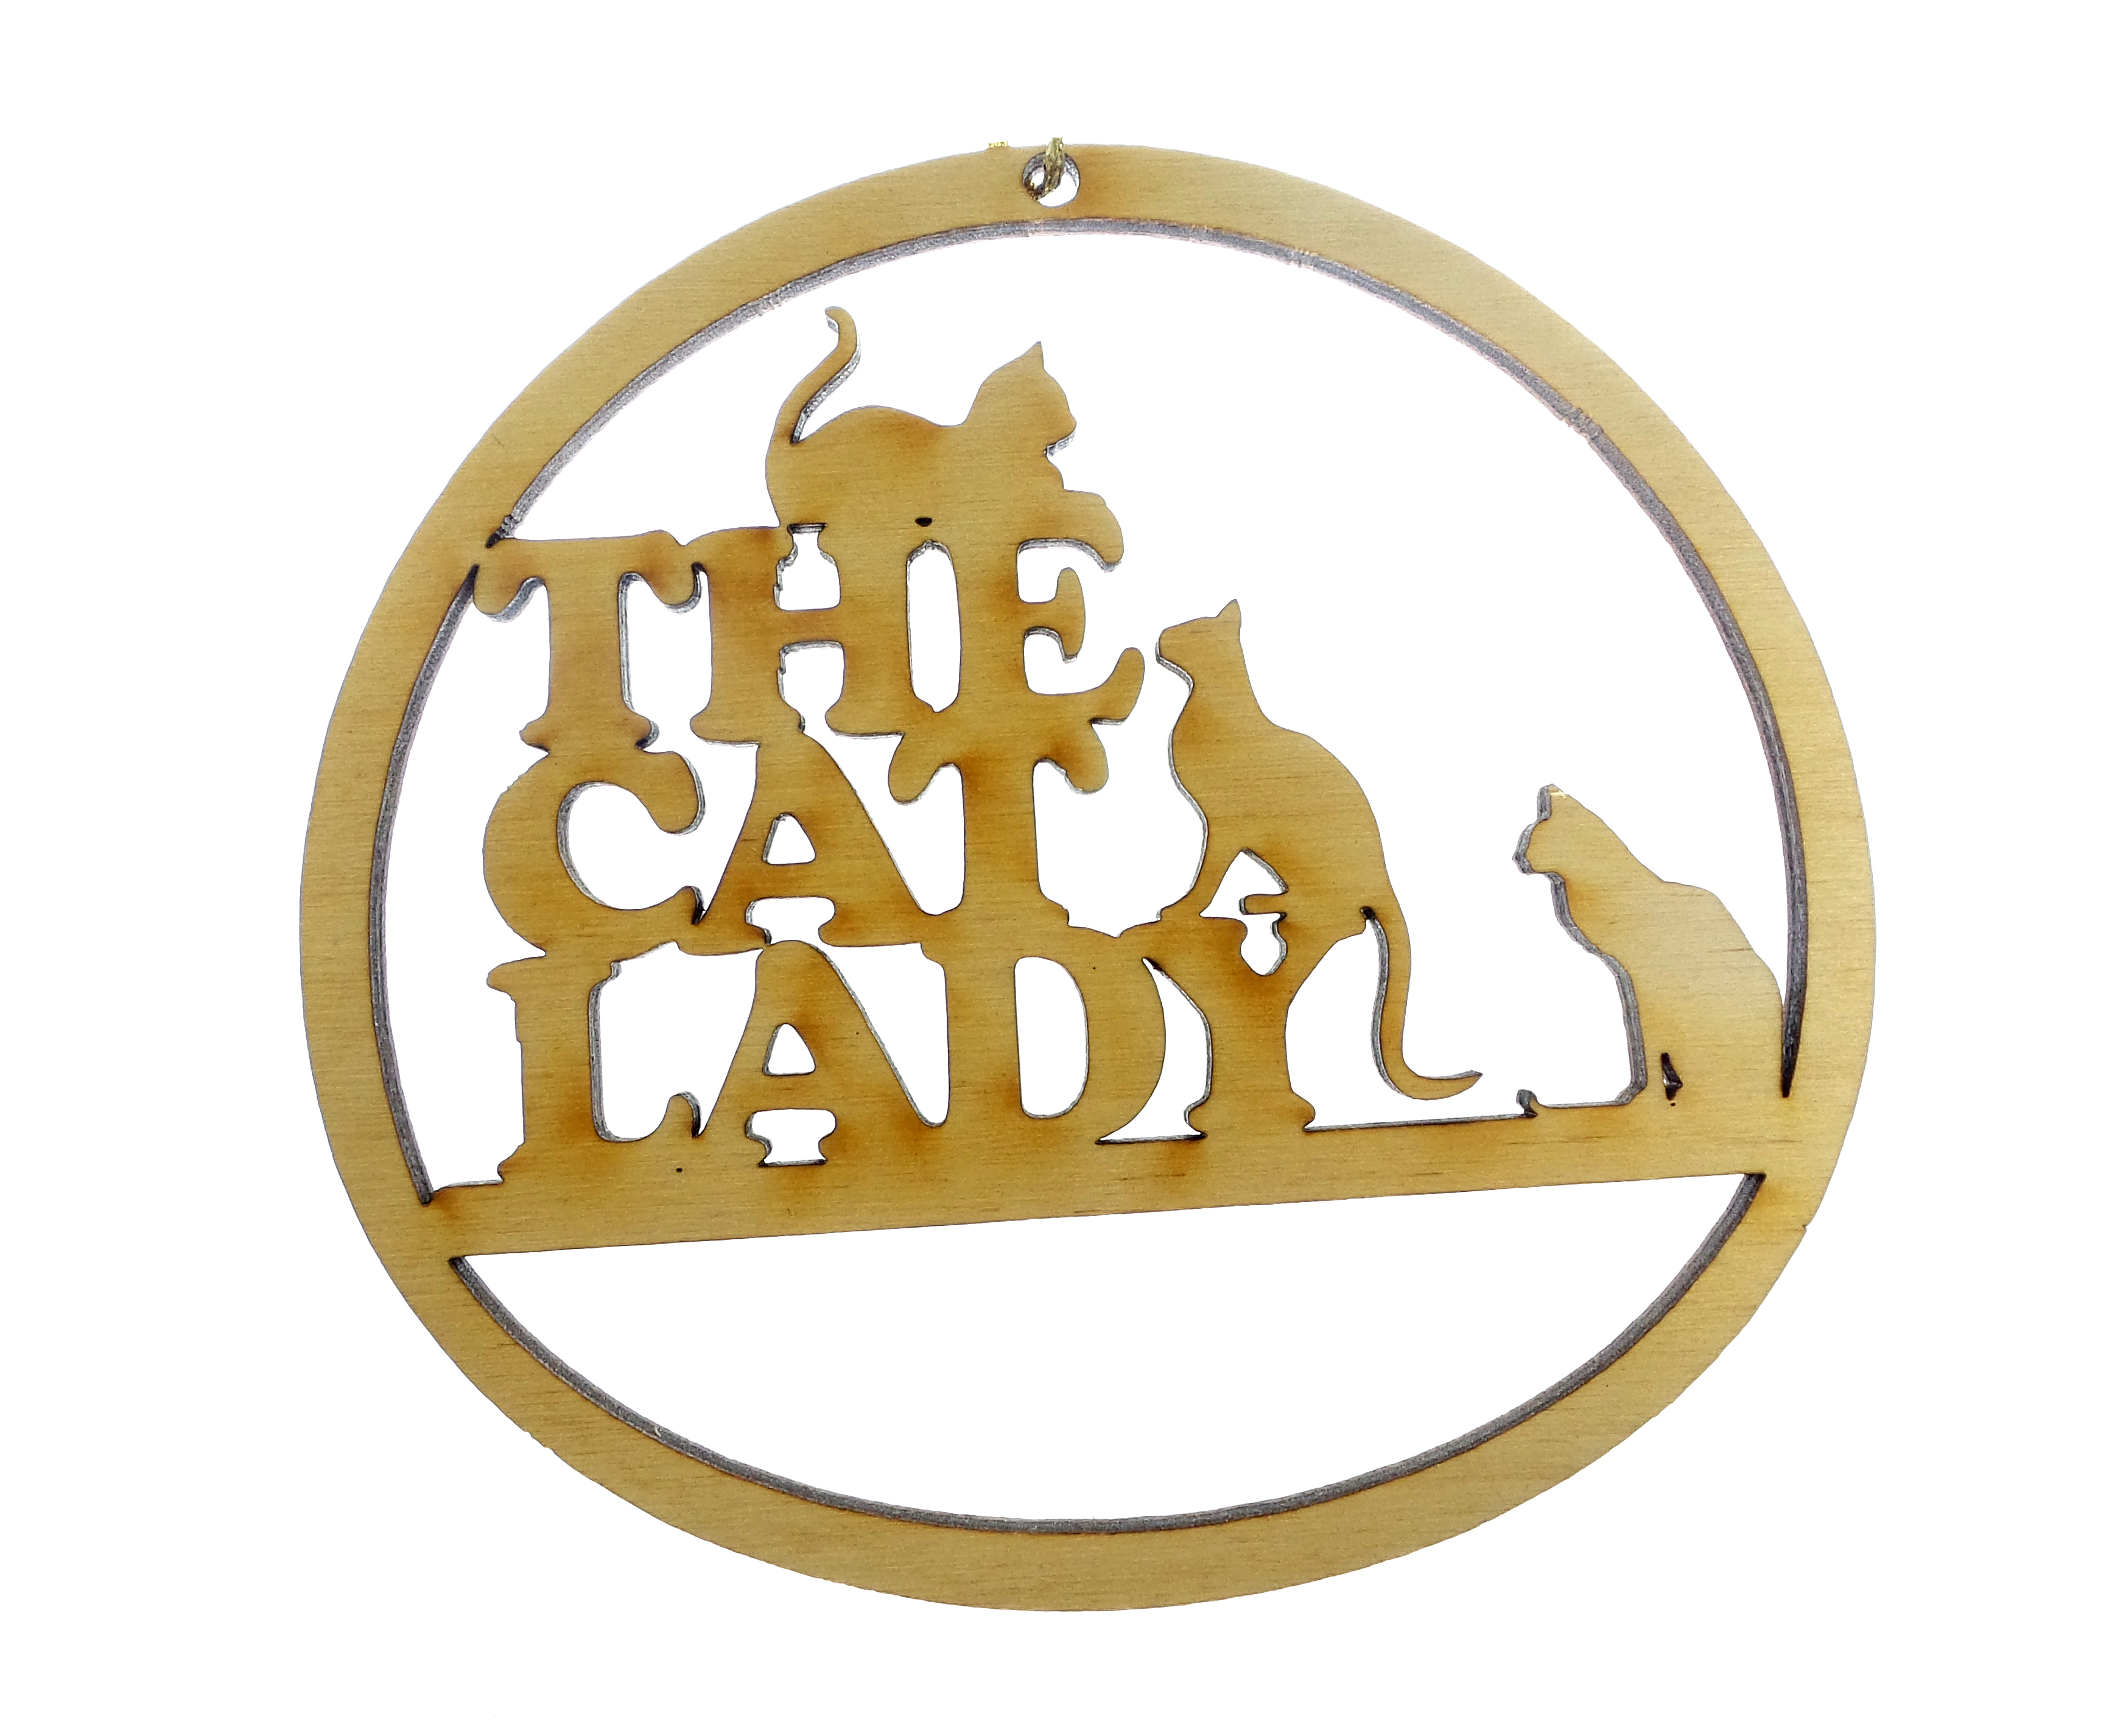 CAT012CatLady